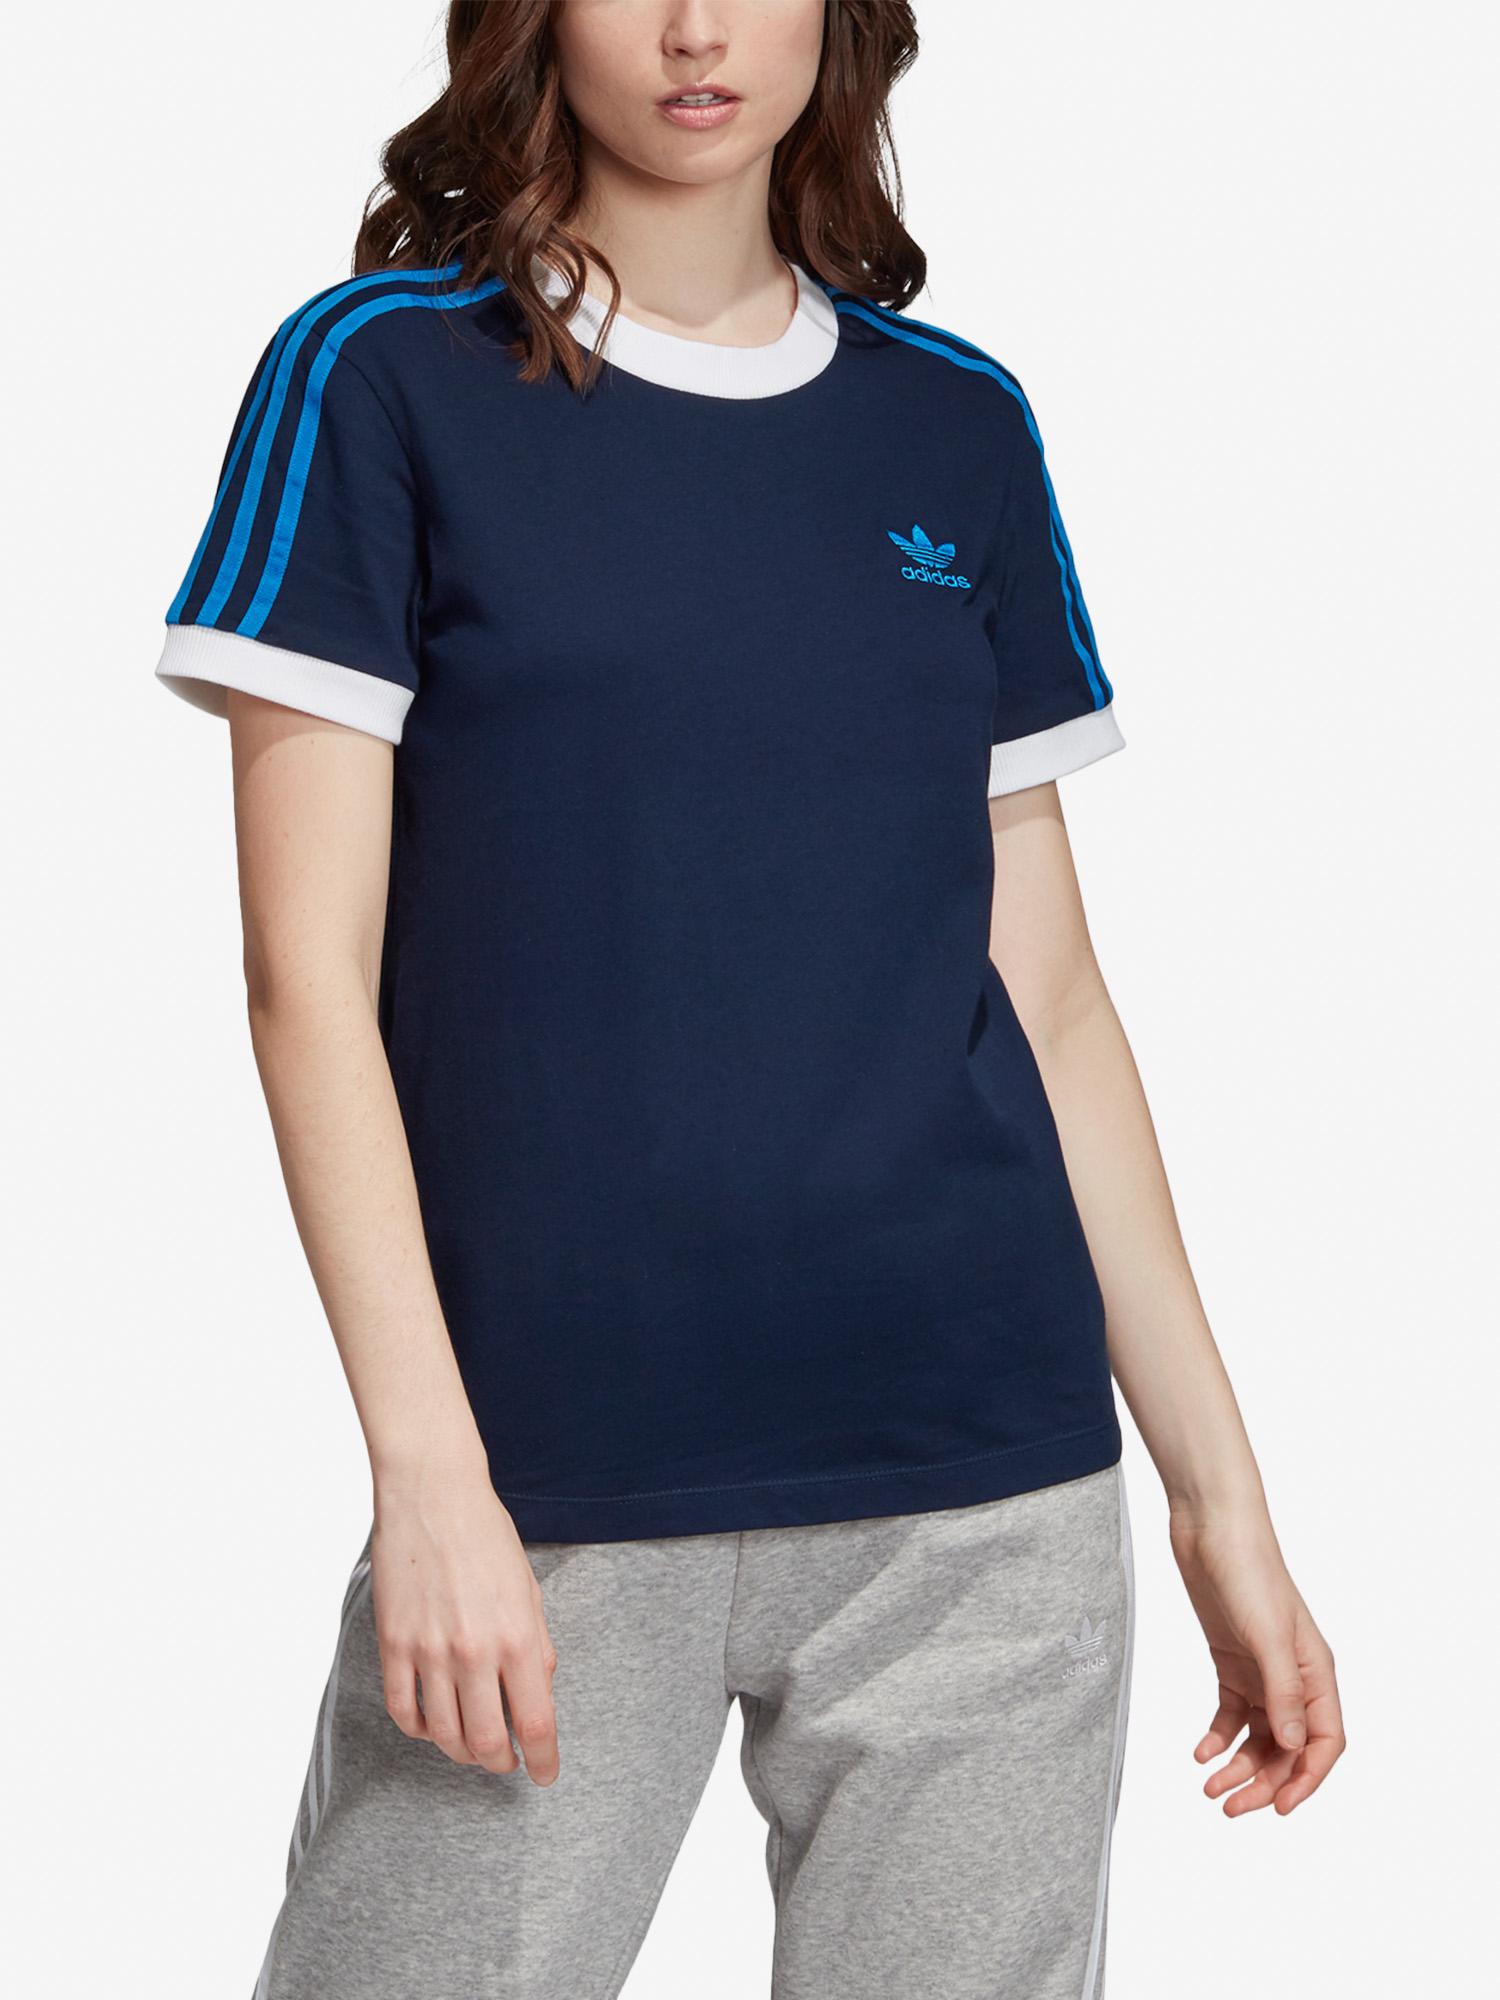 Adidas Originals 3-page Tee T-shirt